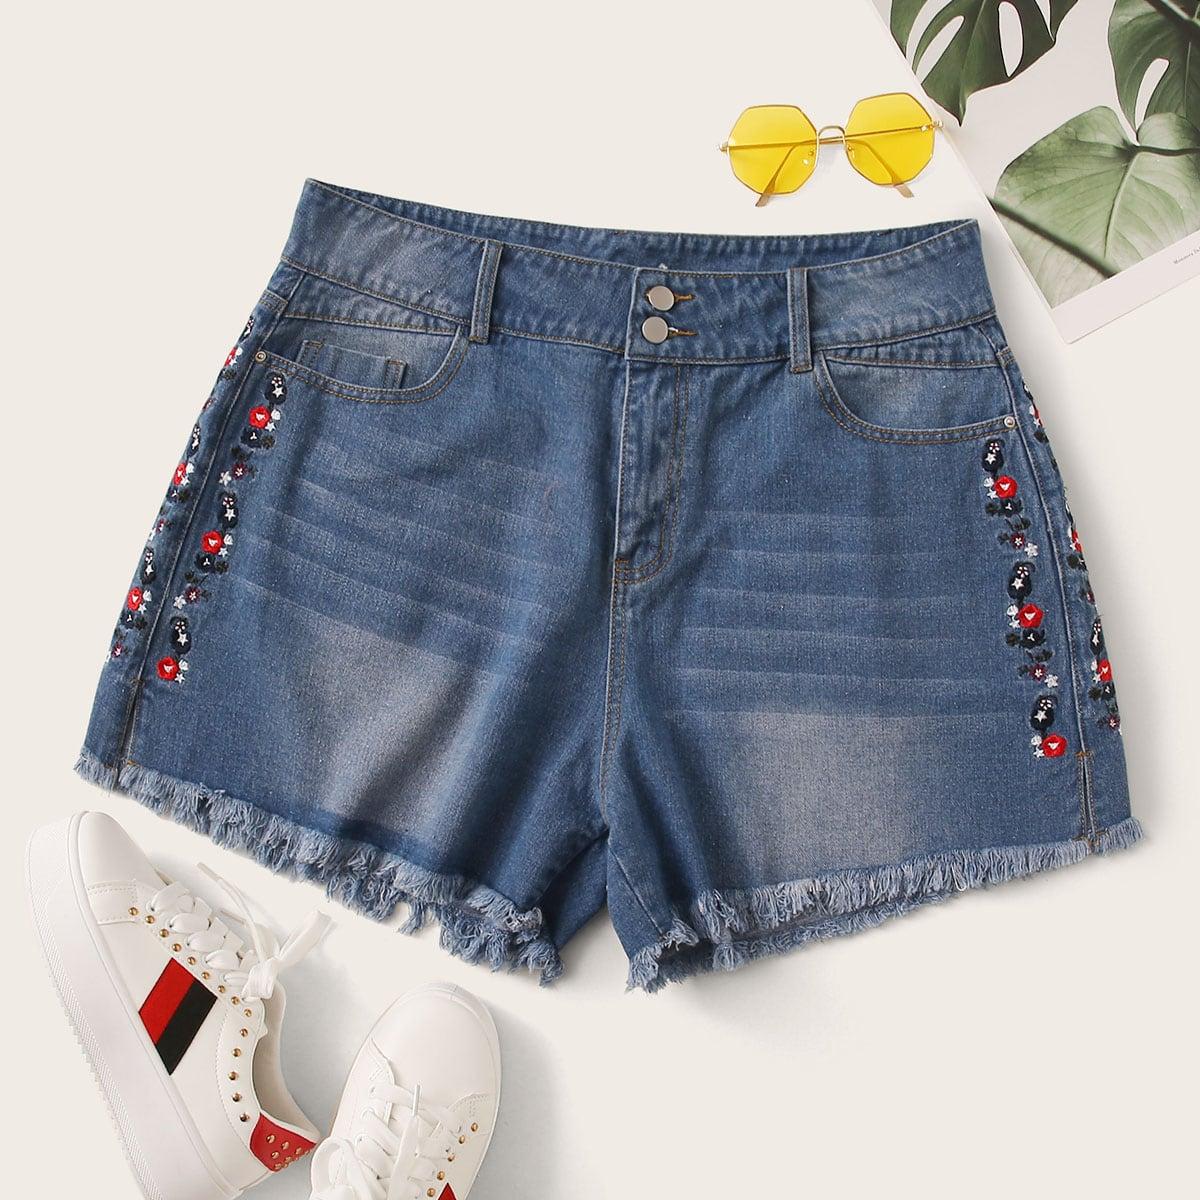 Blauw Casual Bloemen Grote maten denim shorts Borduurwerk